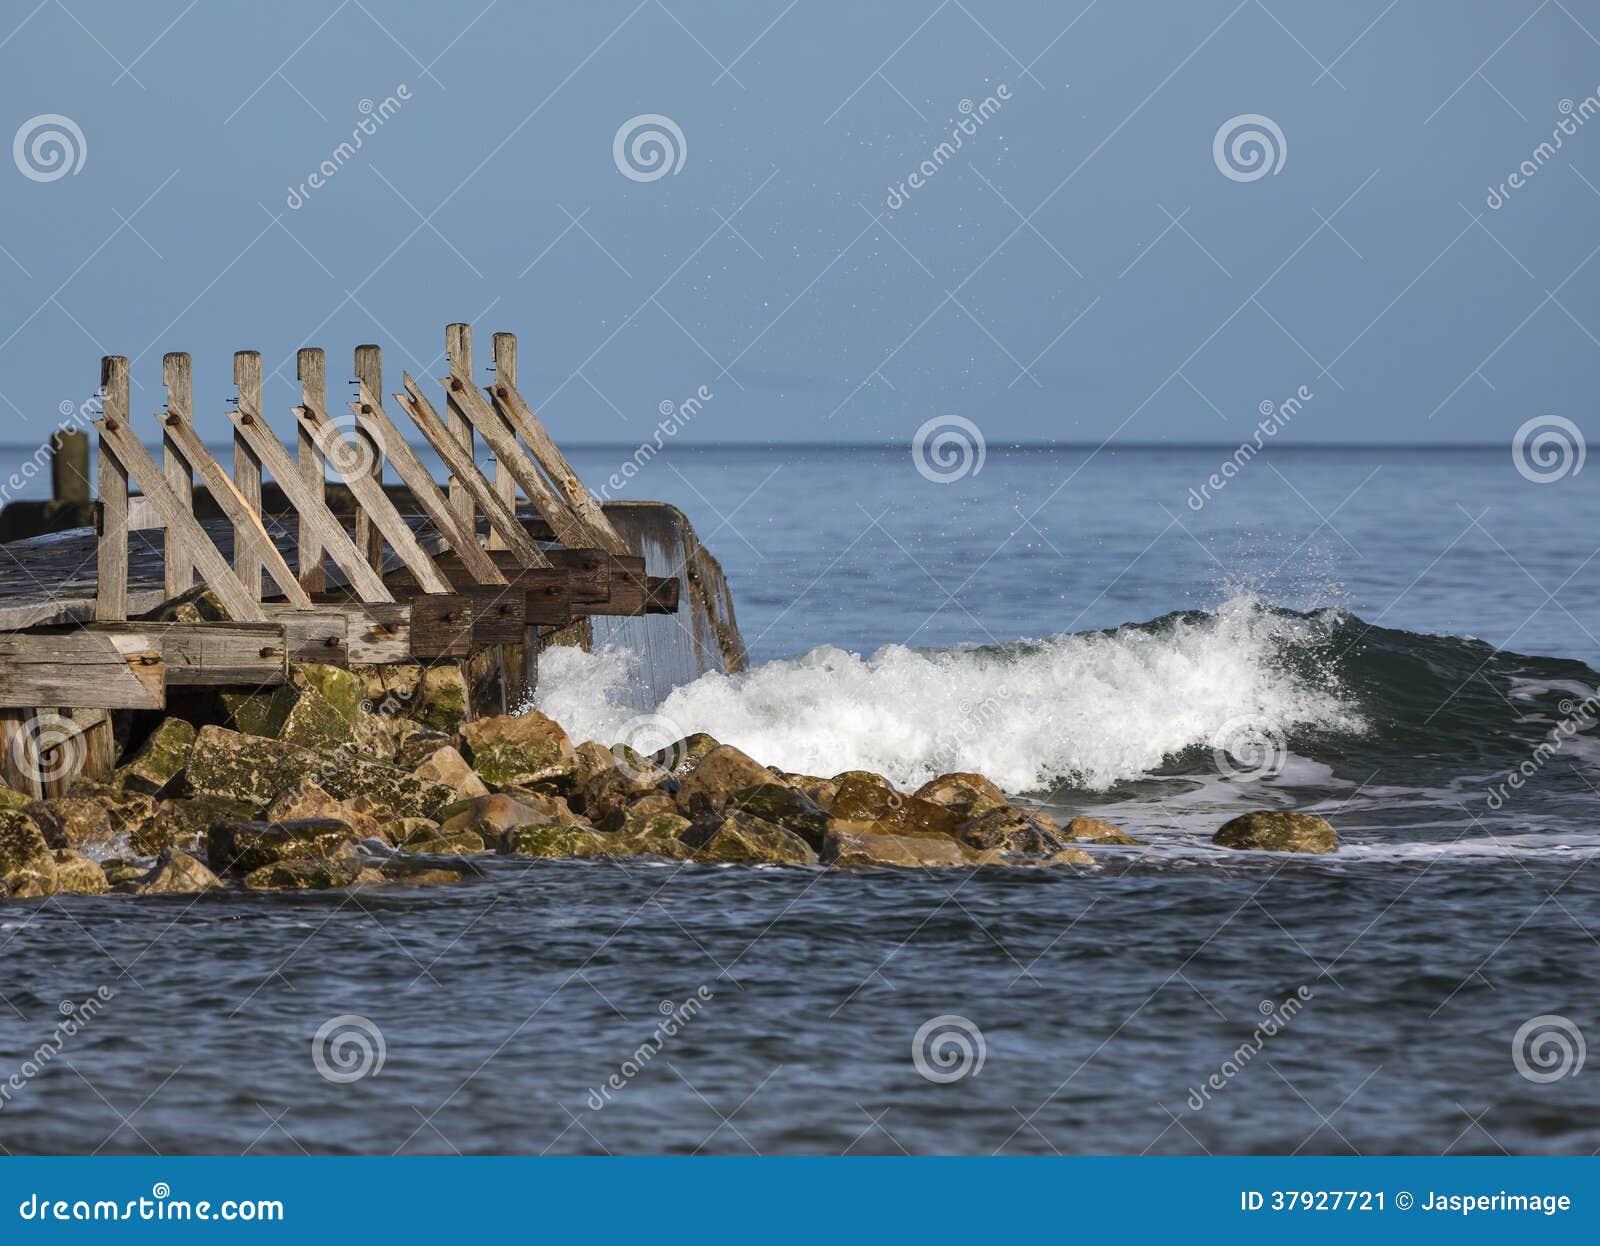 Lossiemouth波浪醒目的防堤。